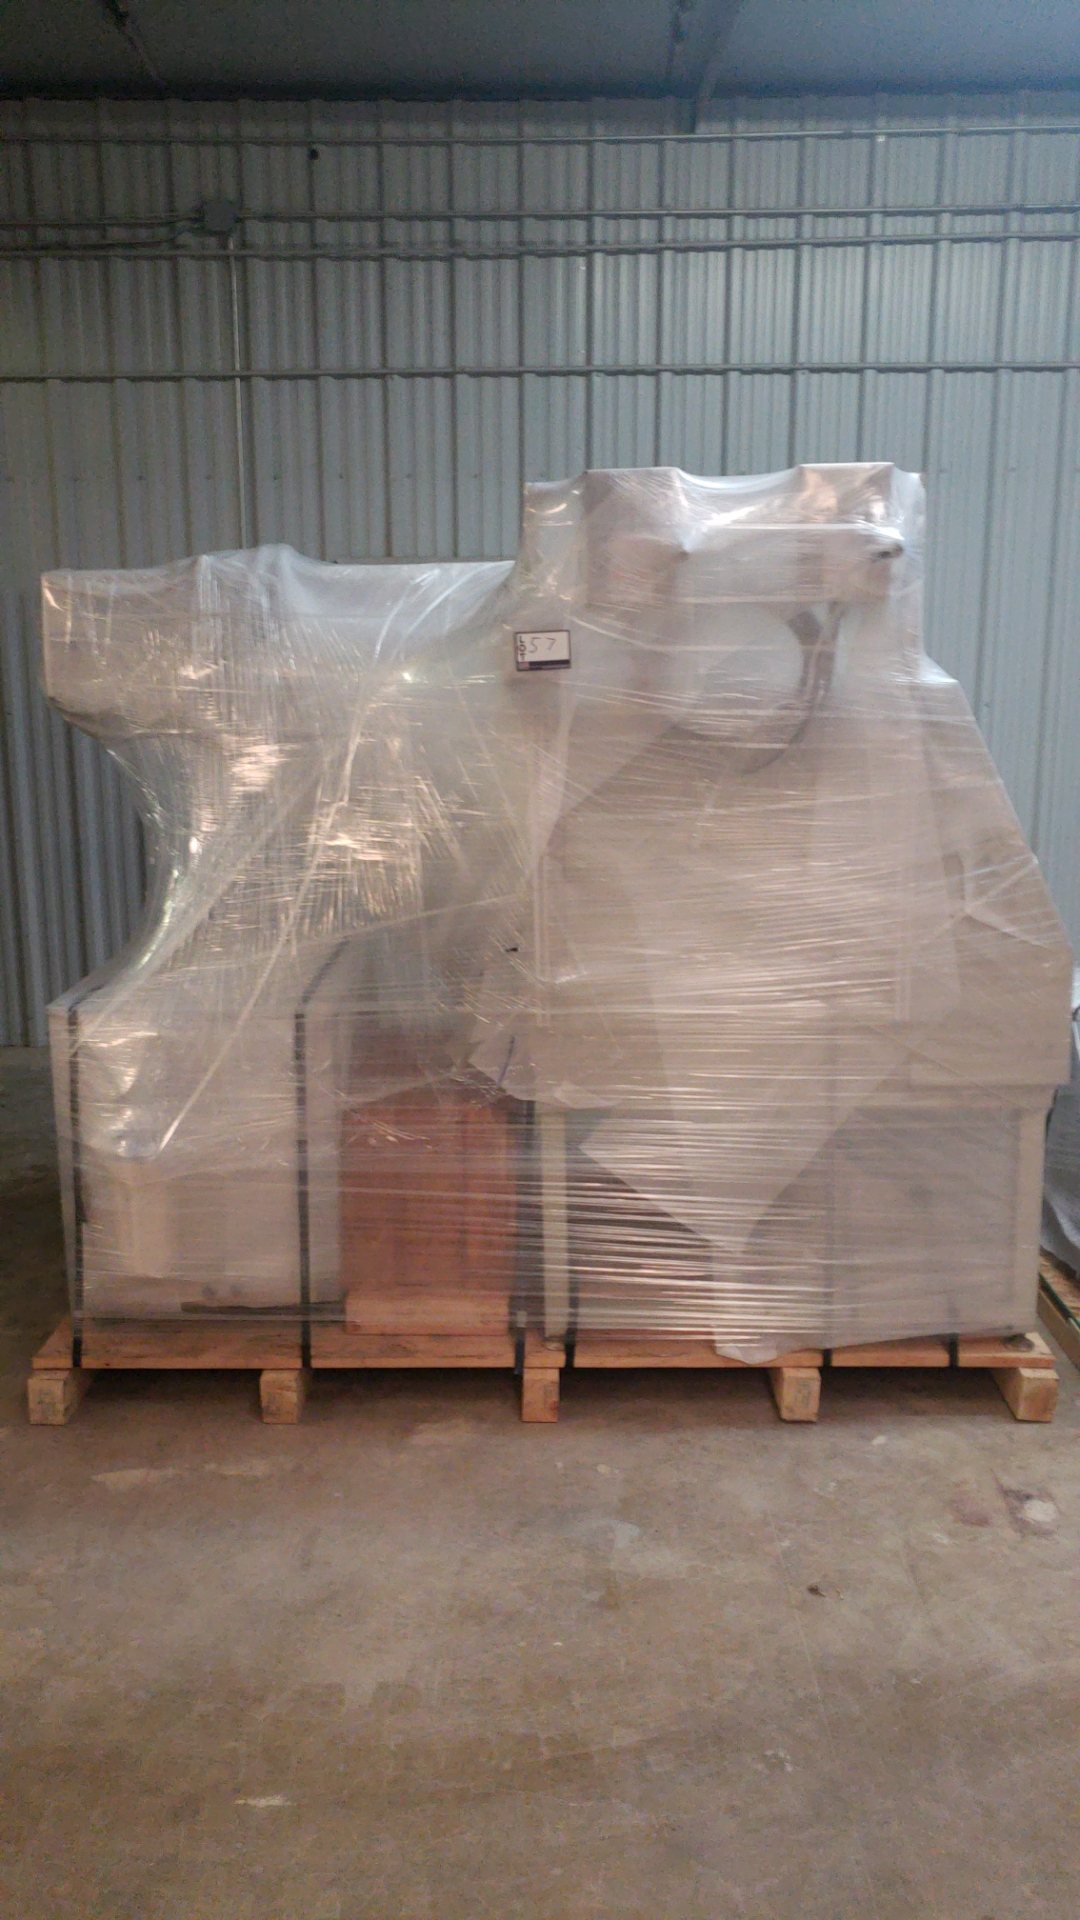 GSI Lumonics HM1400 Laser Marker w/YAG T818/FS/CE Laser, LPS 30 CCS Power Supply 100 watt, - Image 9 of 10